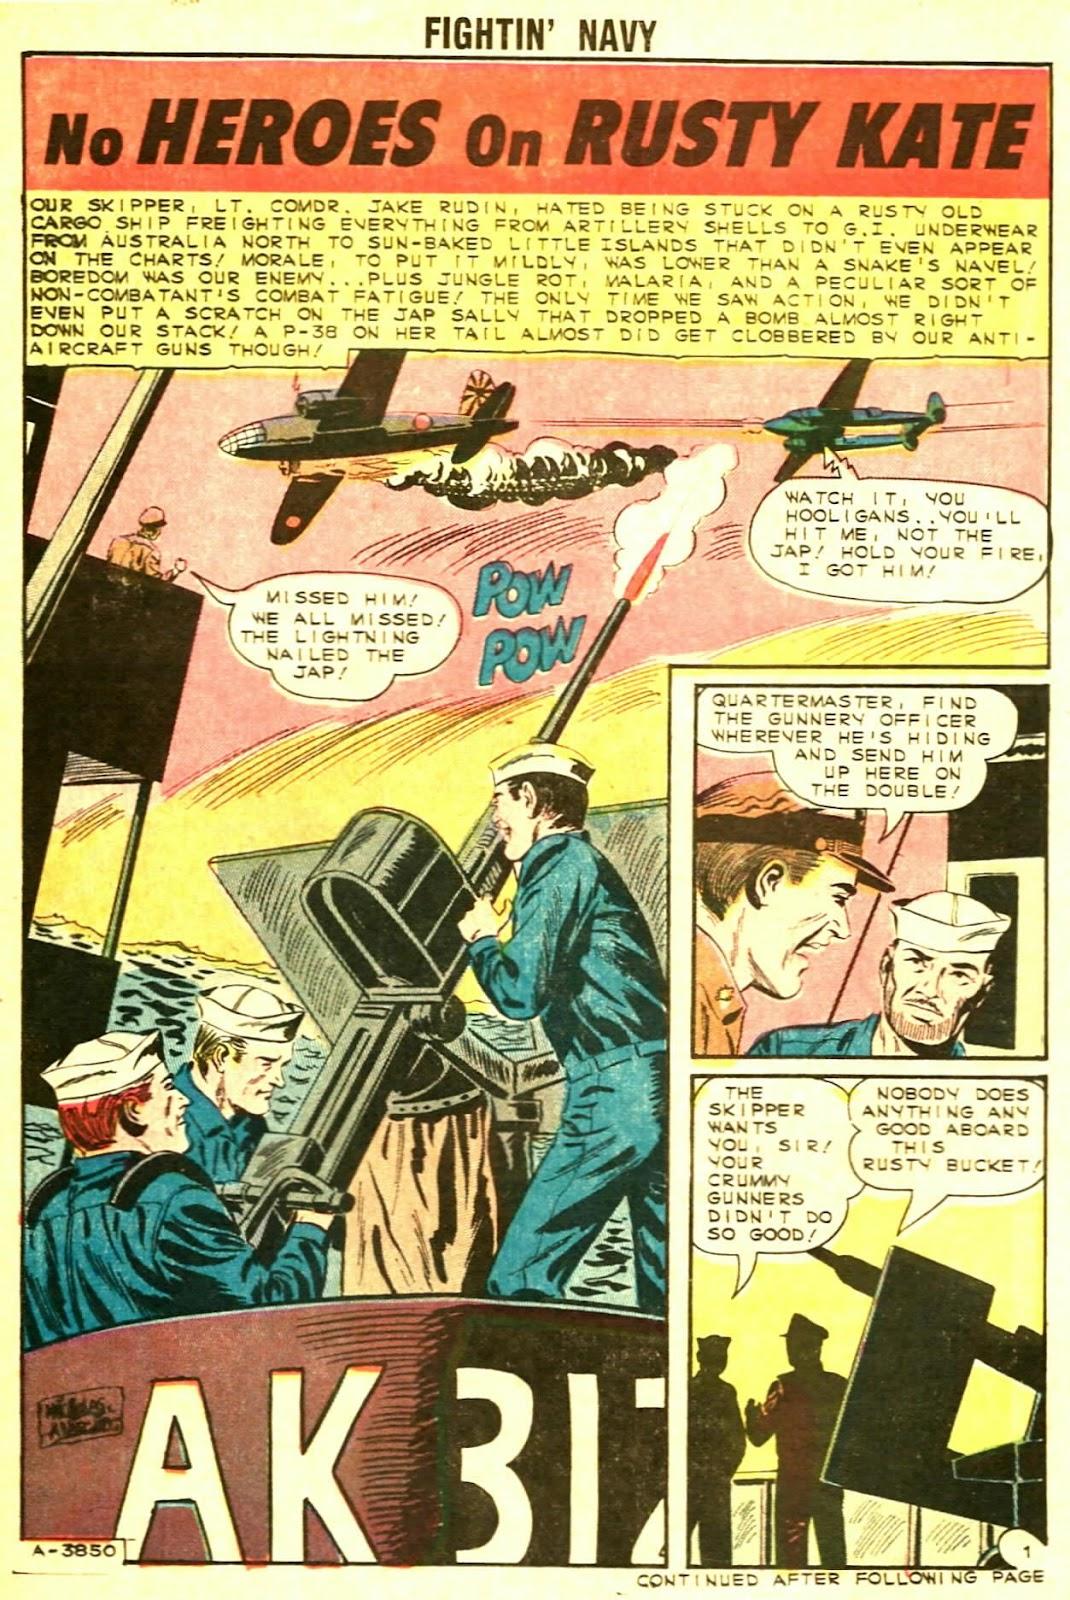 Read online Fightin' Navy comic -  Issue #117 - 14